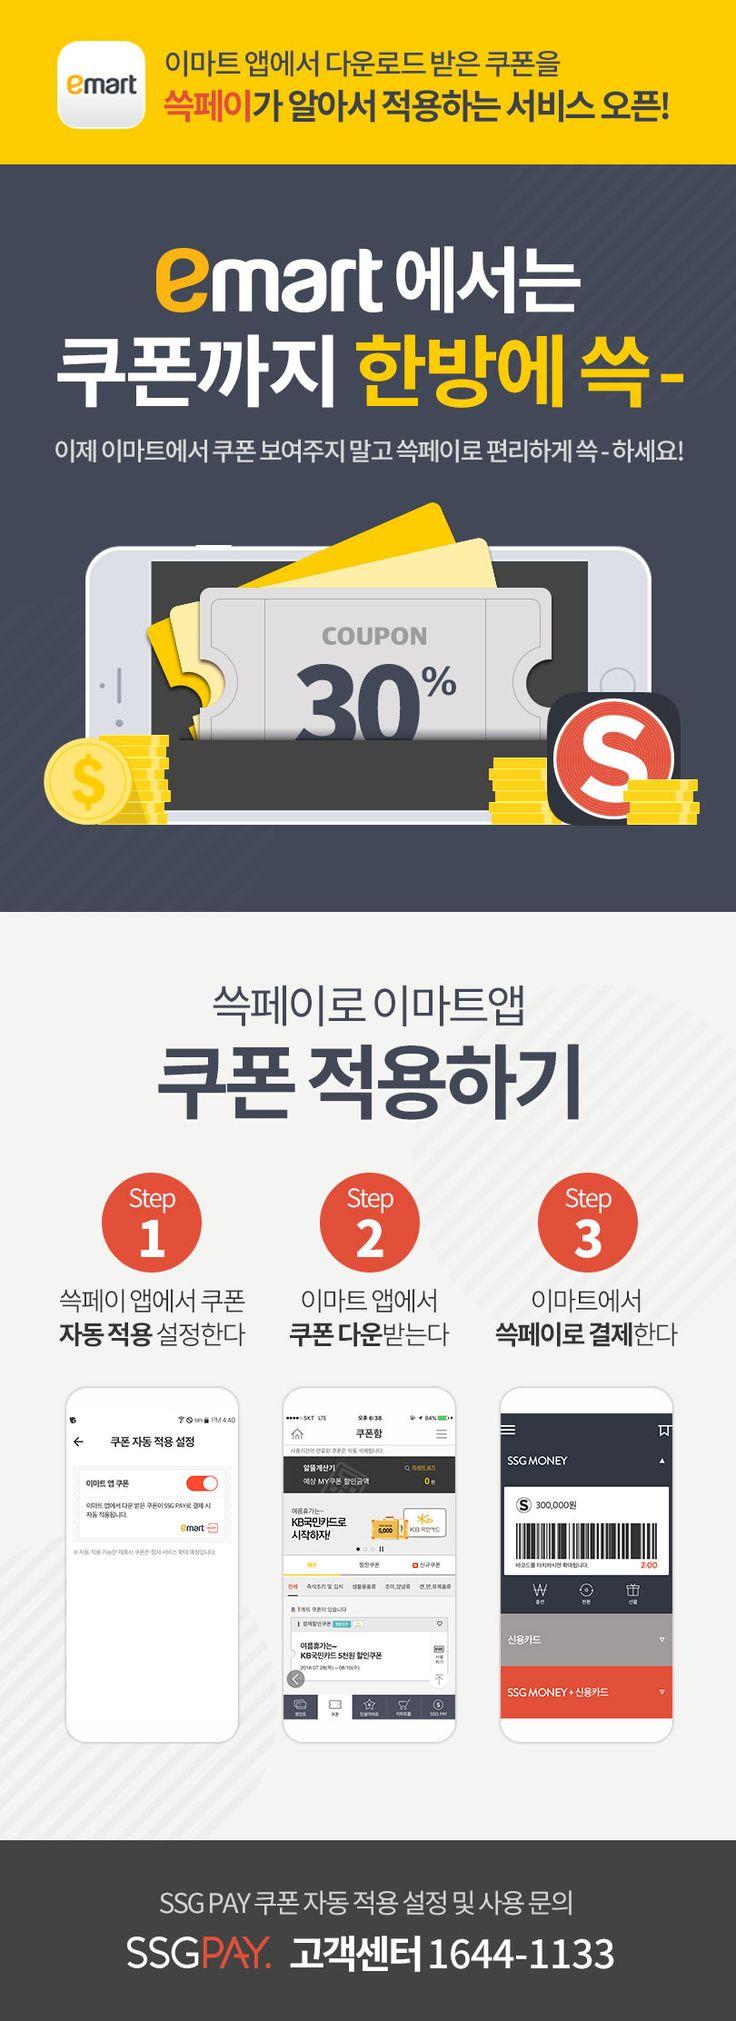 coupon_web_147020900554852.jpg (810×2225)